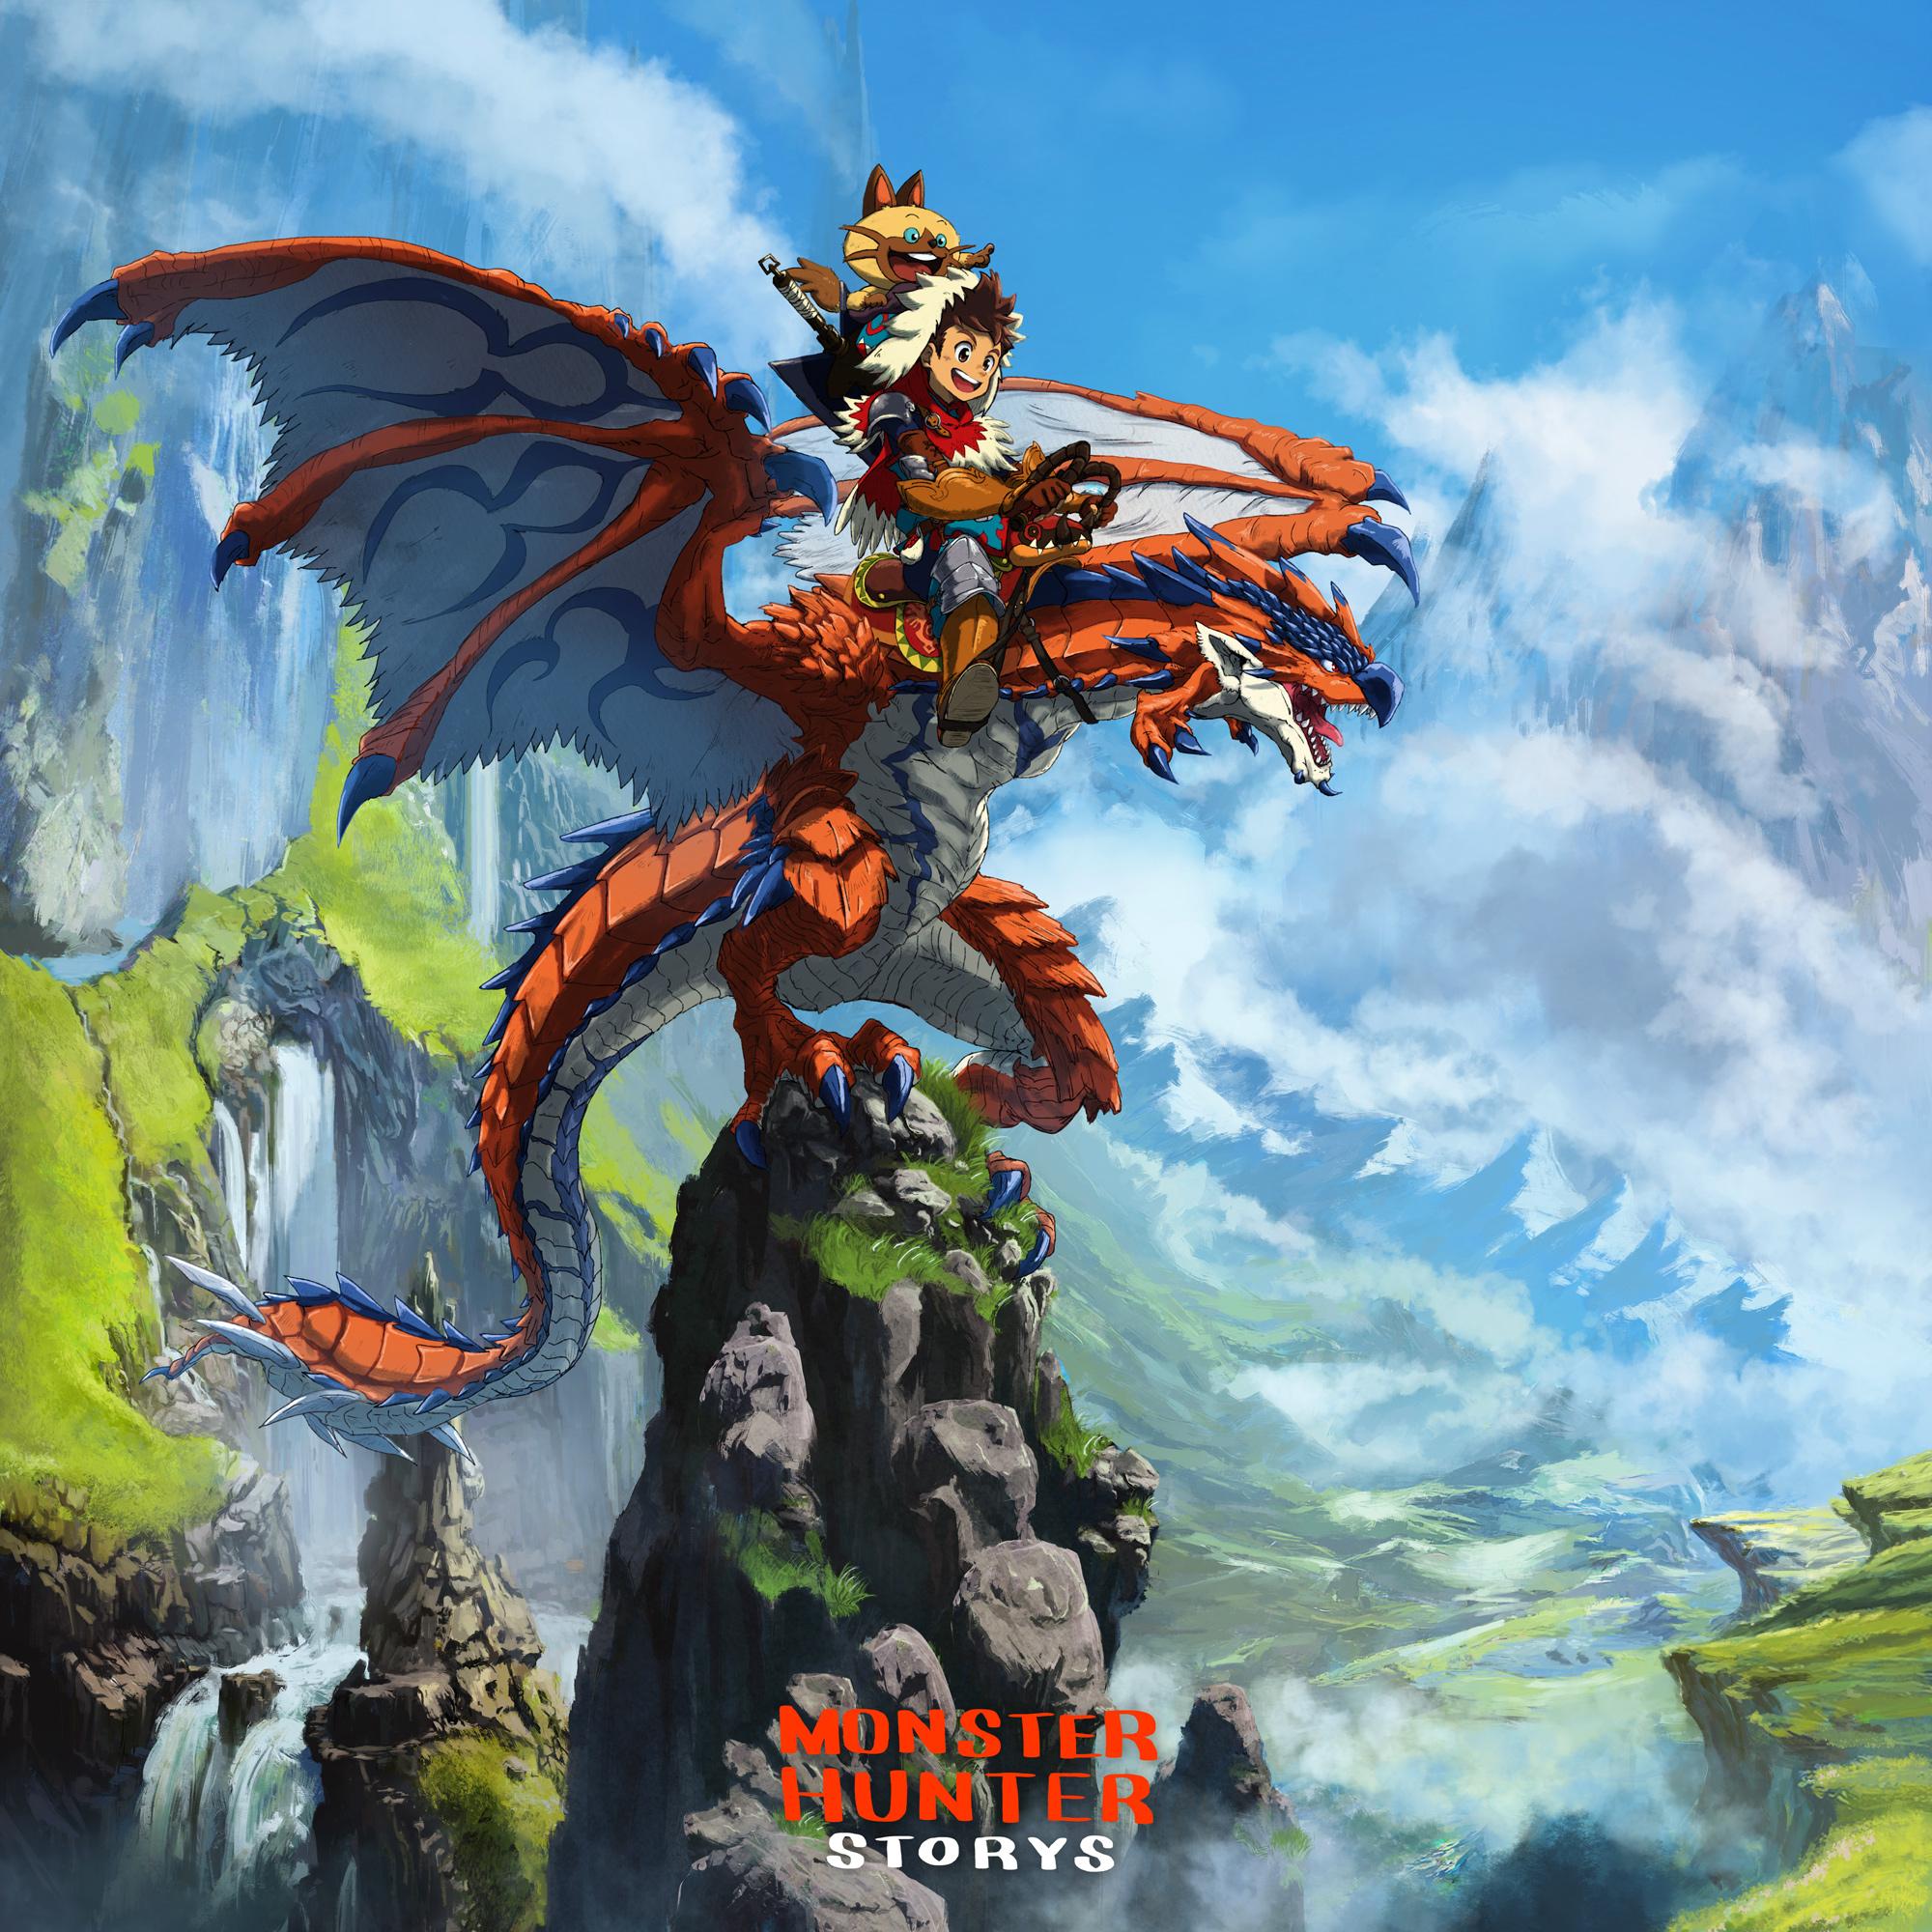 Rathalos Ryuuto Naville And Rider Monster Hunter And 1 More